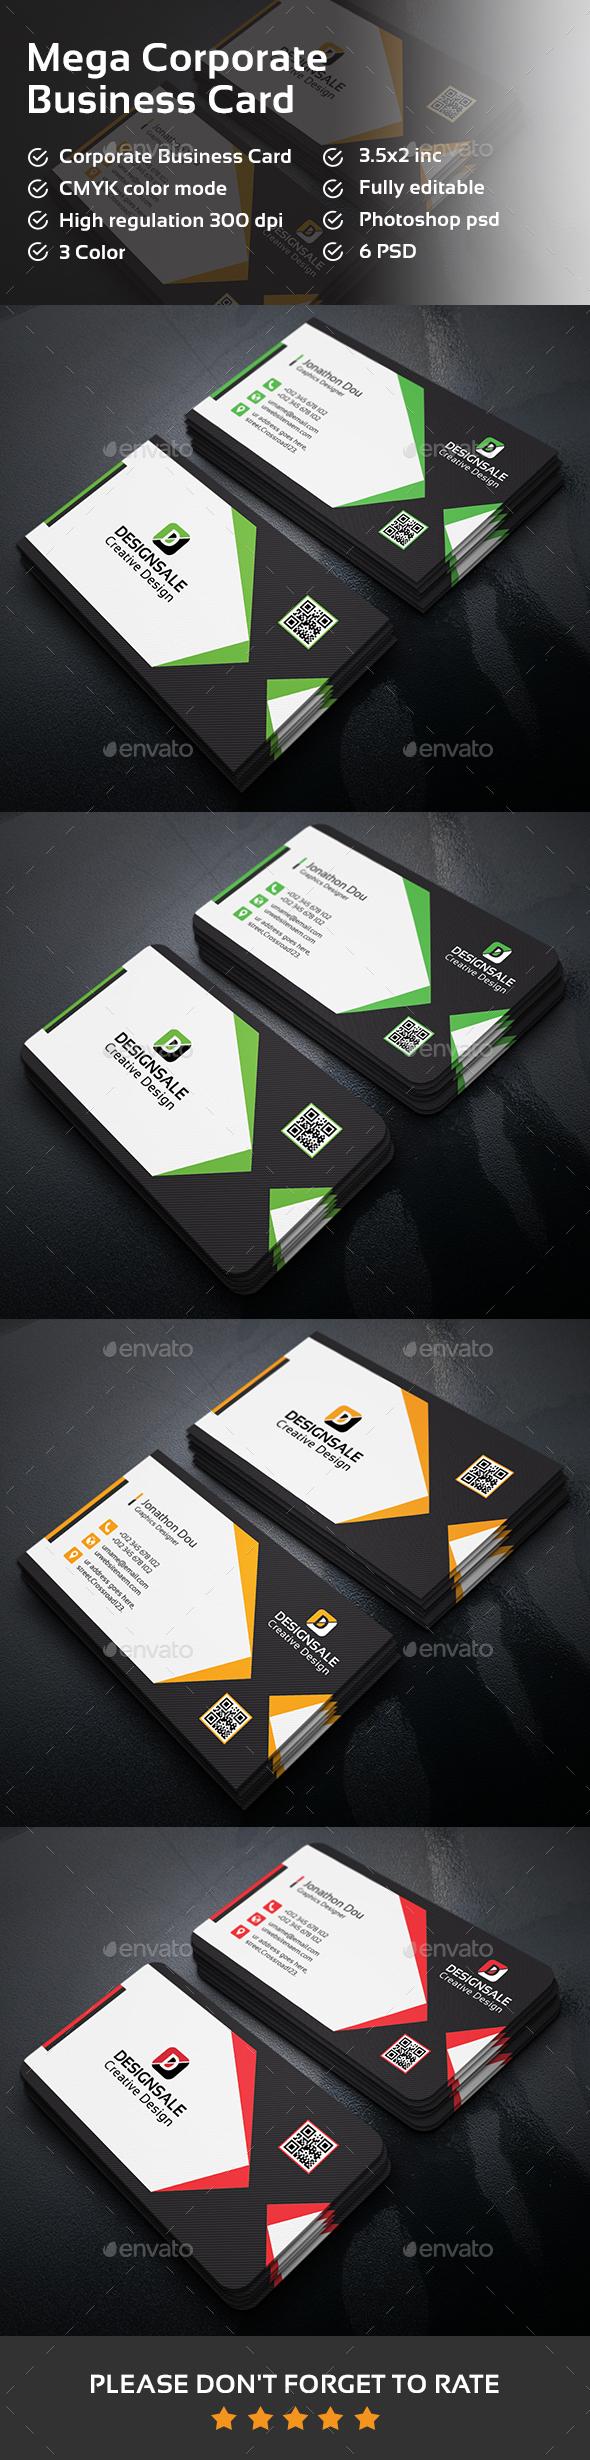 Mega Corporate Business Card - Corporate Business Cards